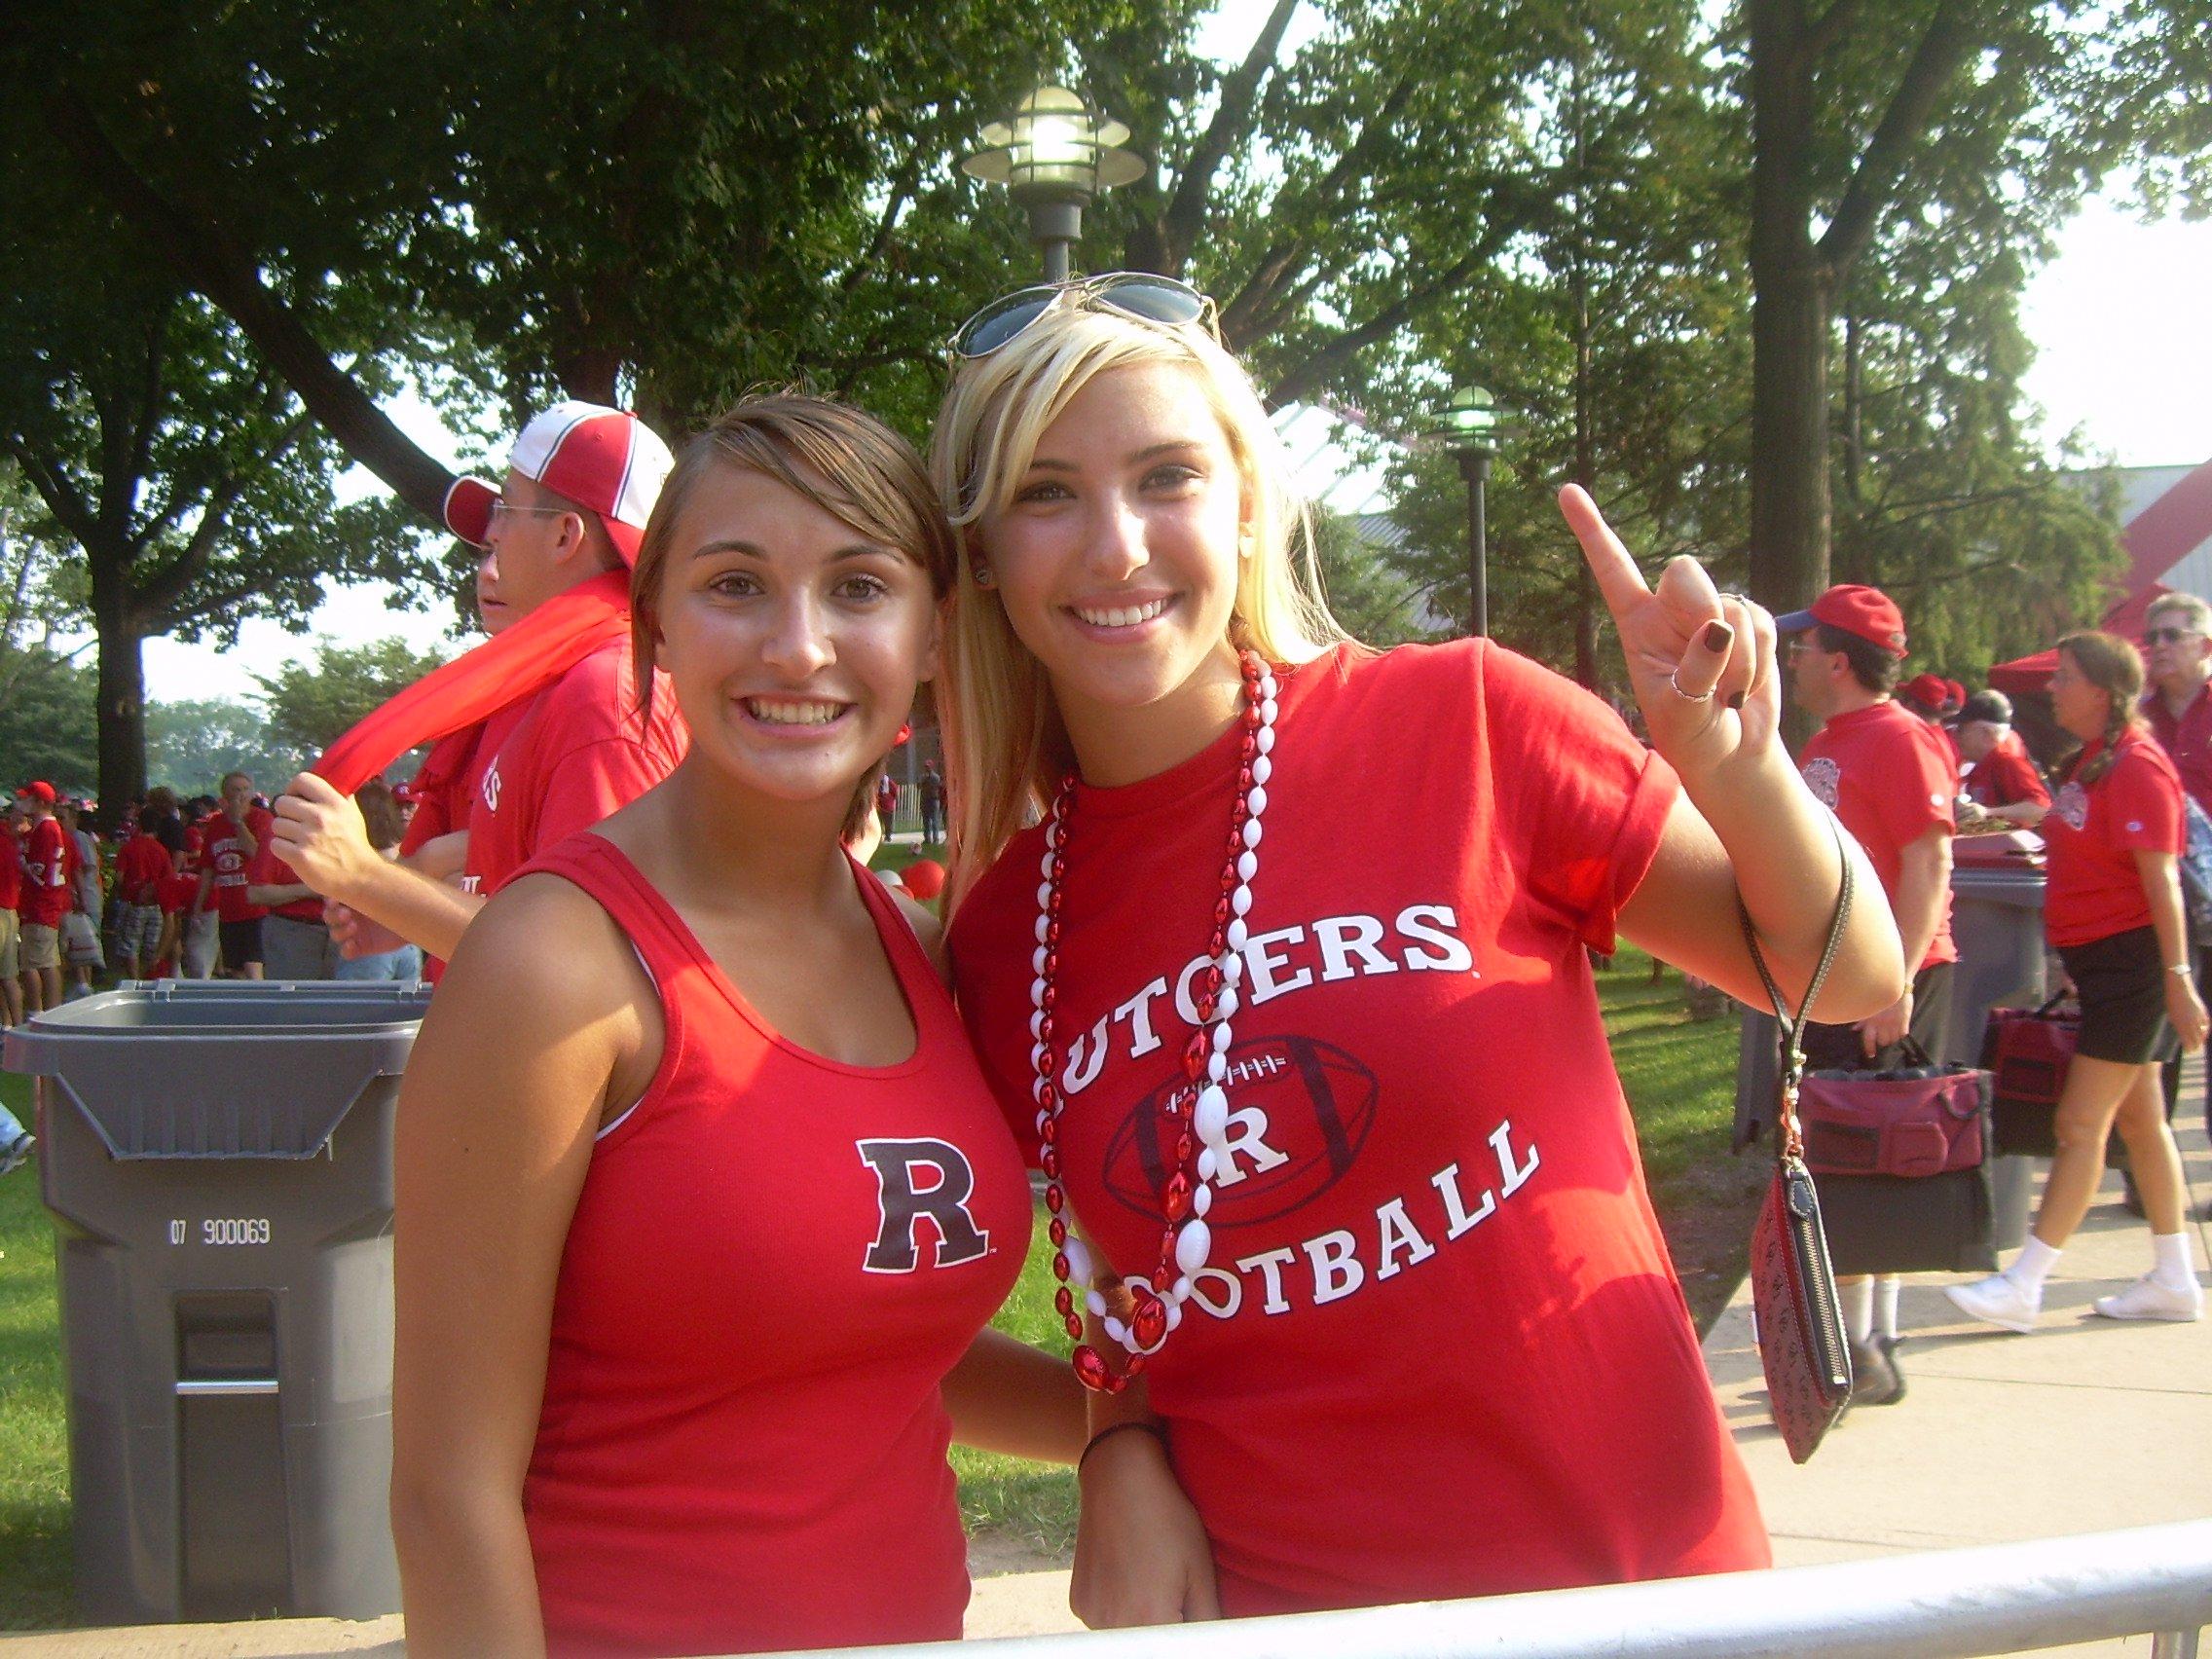 Rutgers roomates 2